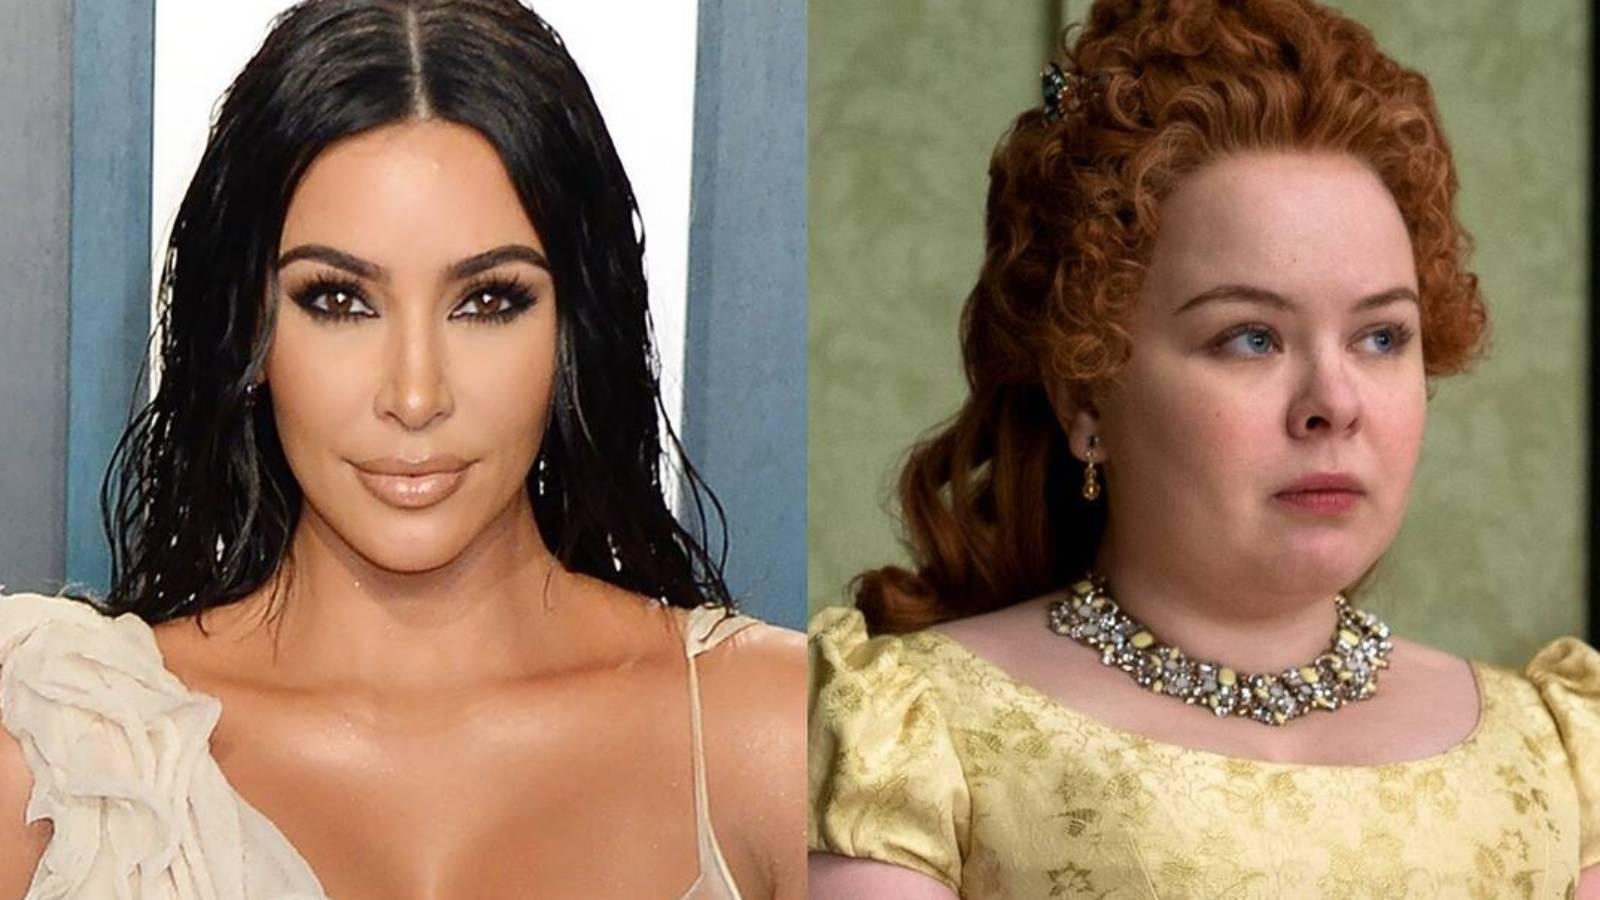 Star reveals how the Kardashians inspired Bridgerton